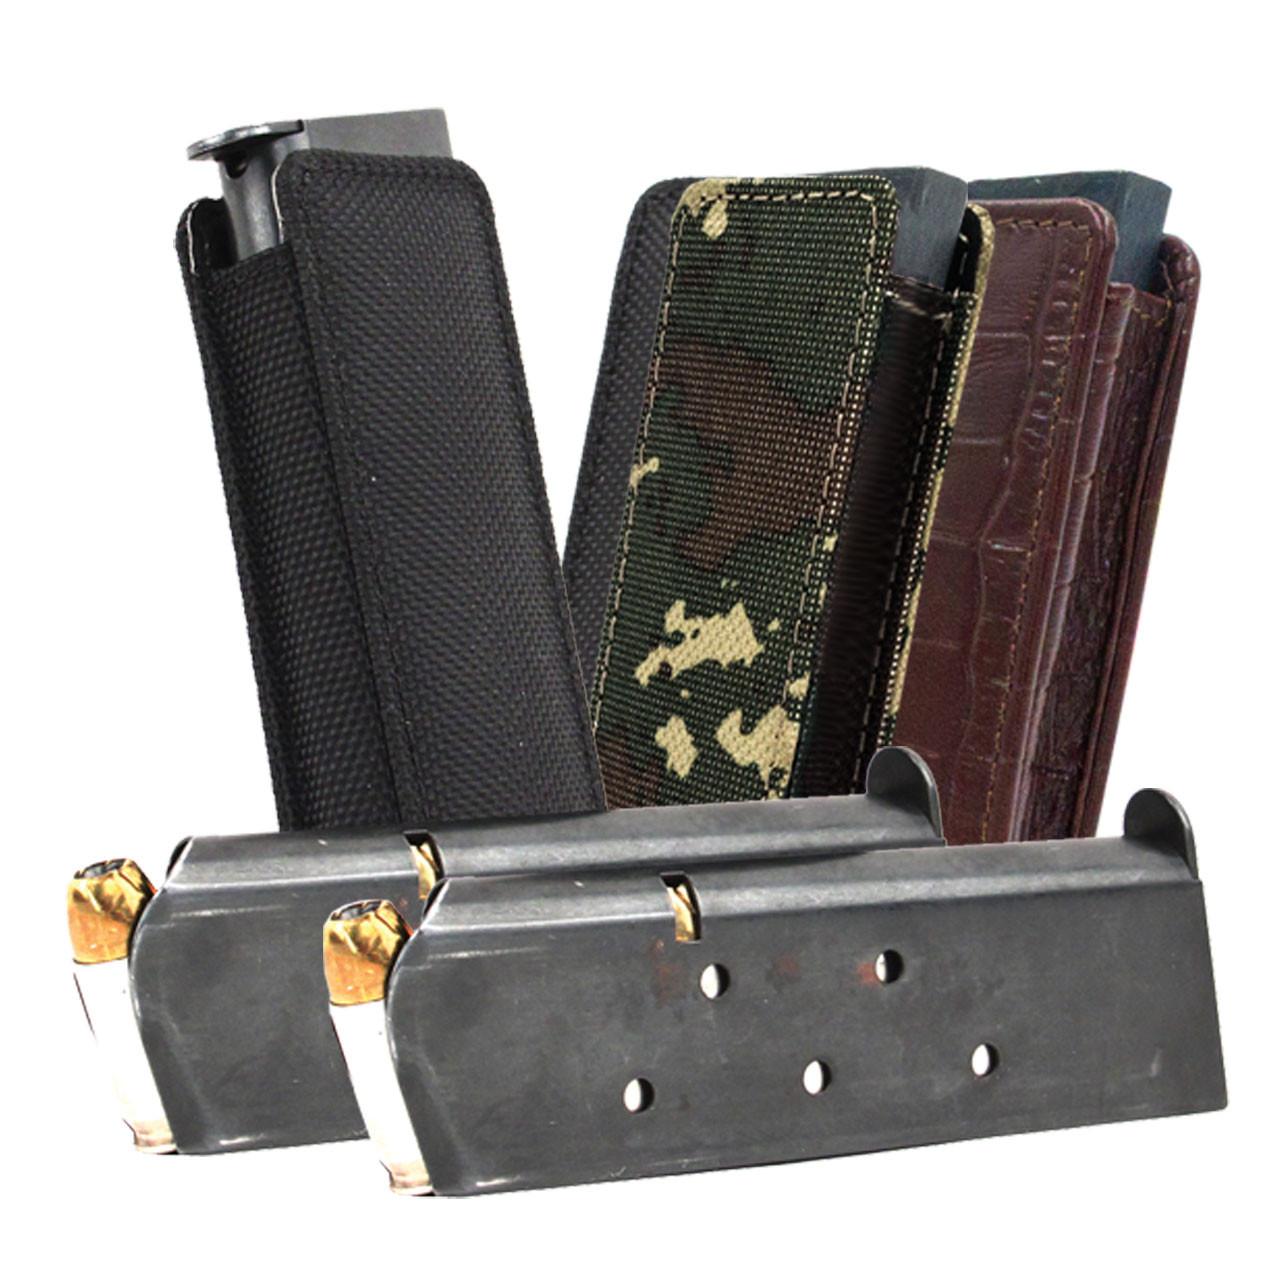 Sig Sauer P290 Magazine Pocket Protector